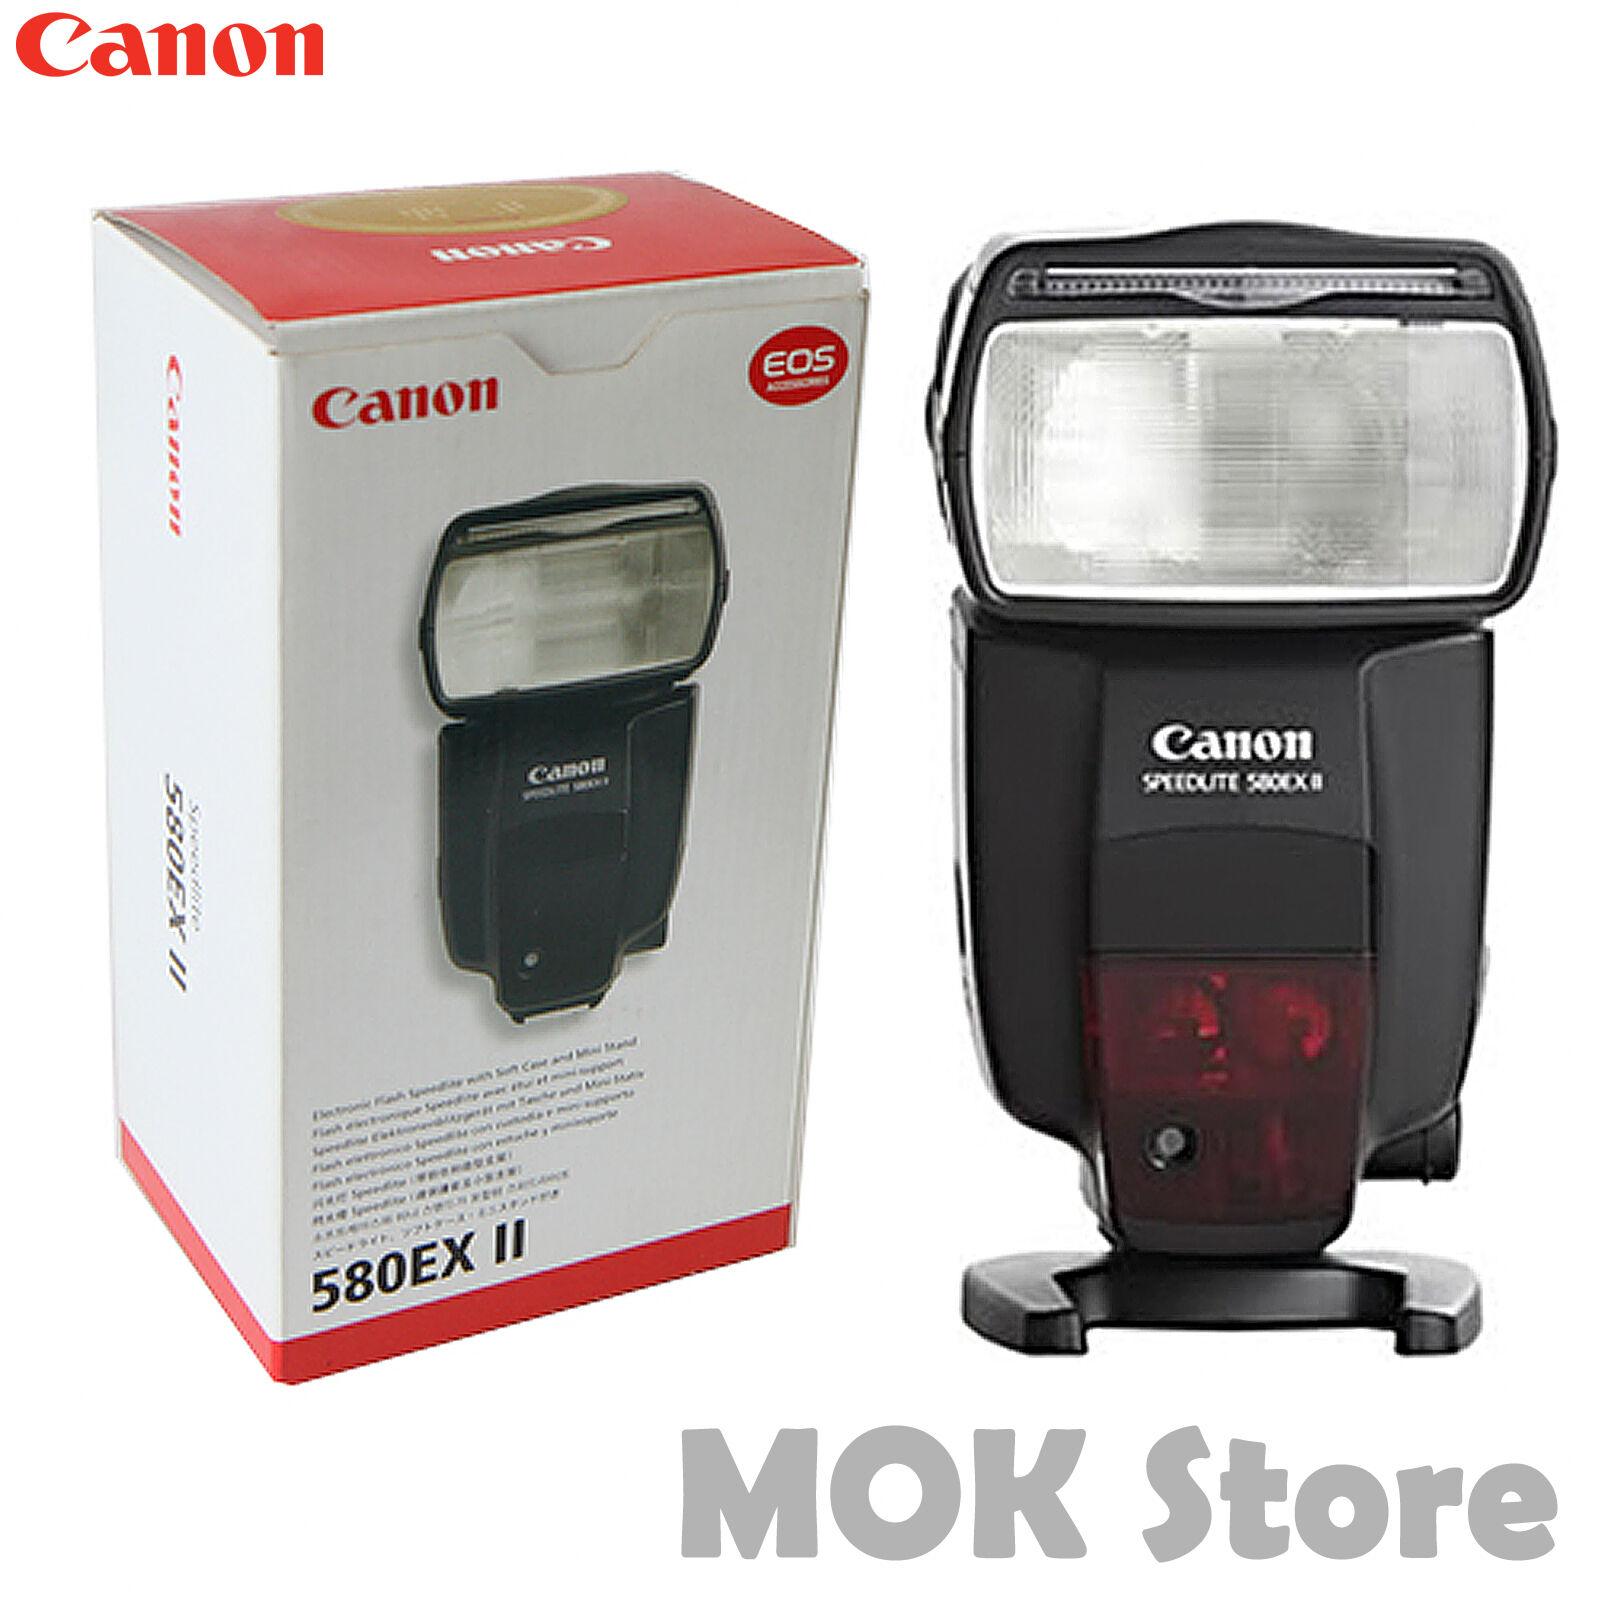 canon speedlite 580ex ii shoe mount flash for canon dslr eos retail box 13803078800 ebay canon speedlite 420ex guide number canon speedlite 420ex guide number